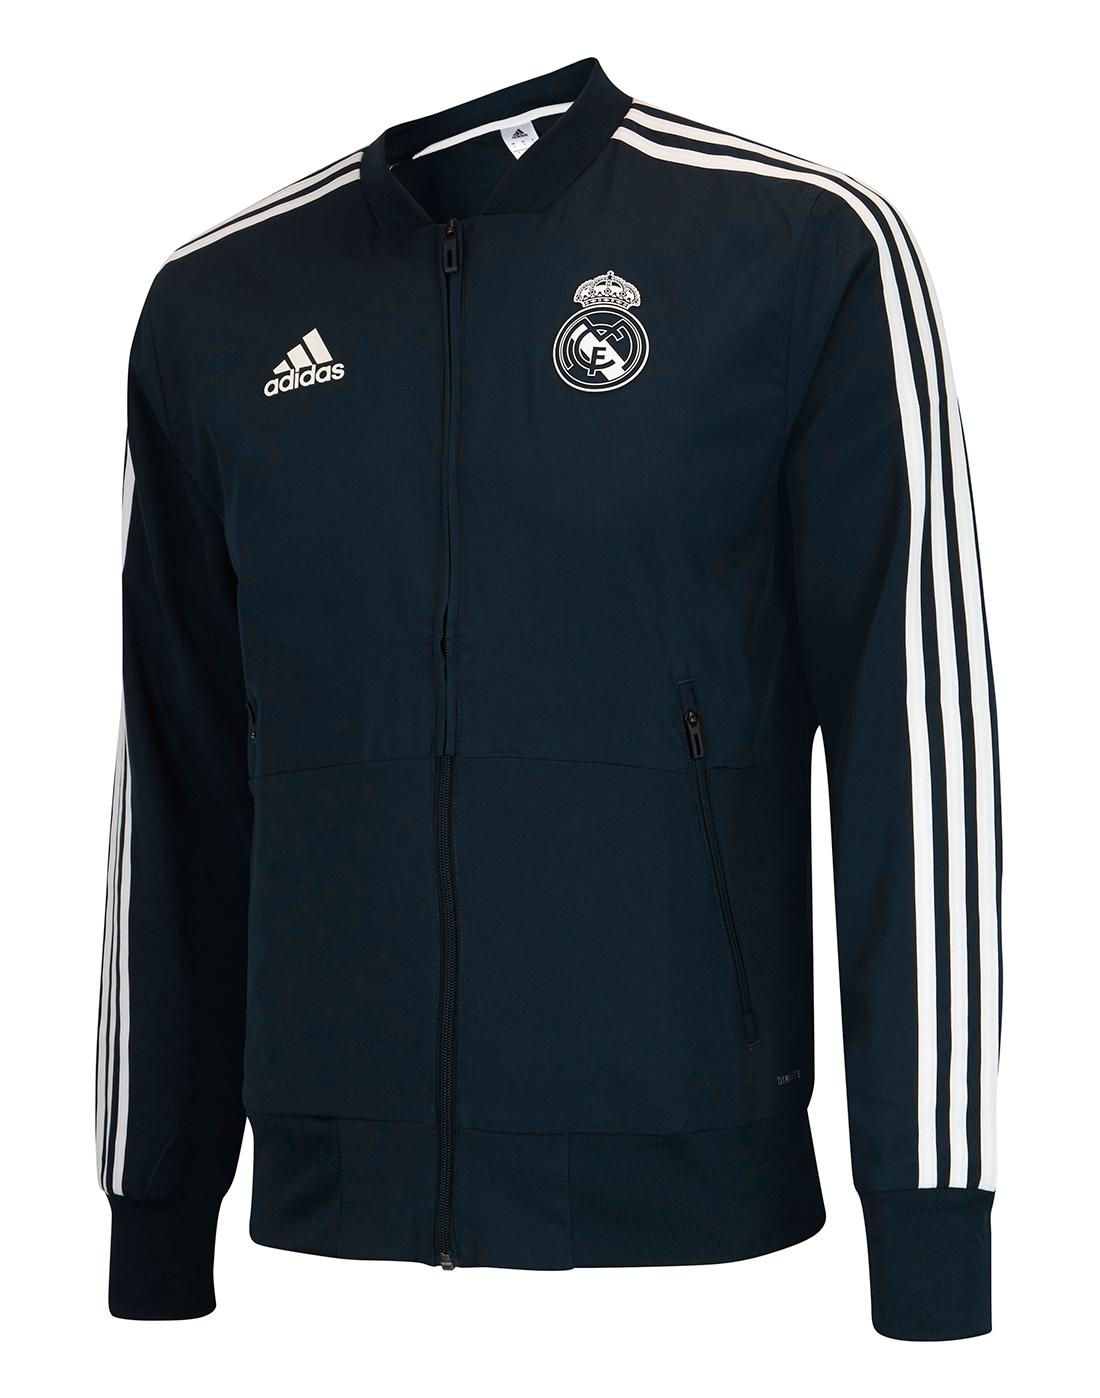 5a5b442e65d2 Adult Real Madrid Presentation Jacket · Adult Real Madrid Presentation  Jacket ...